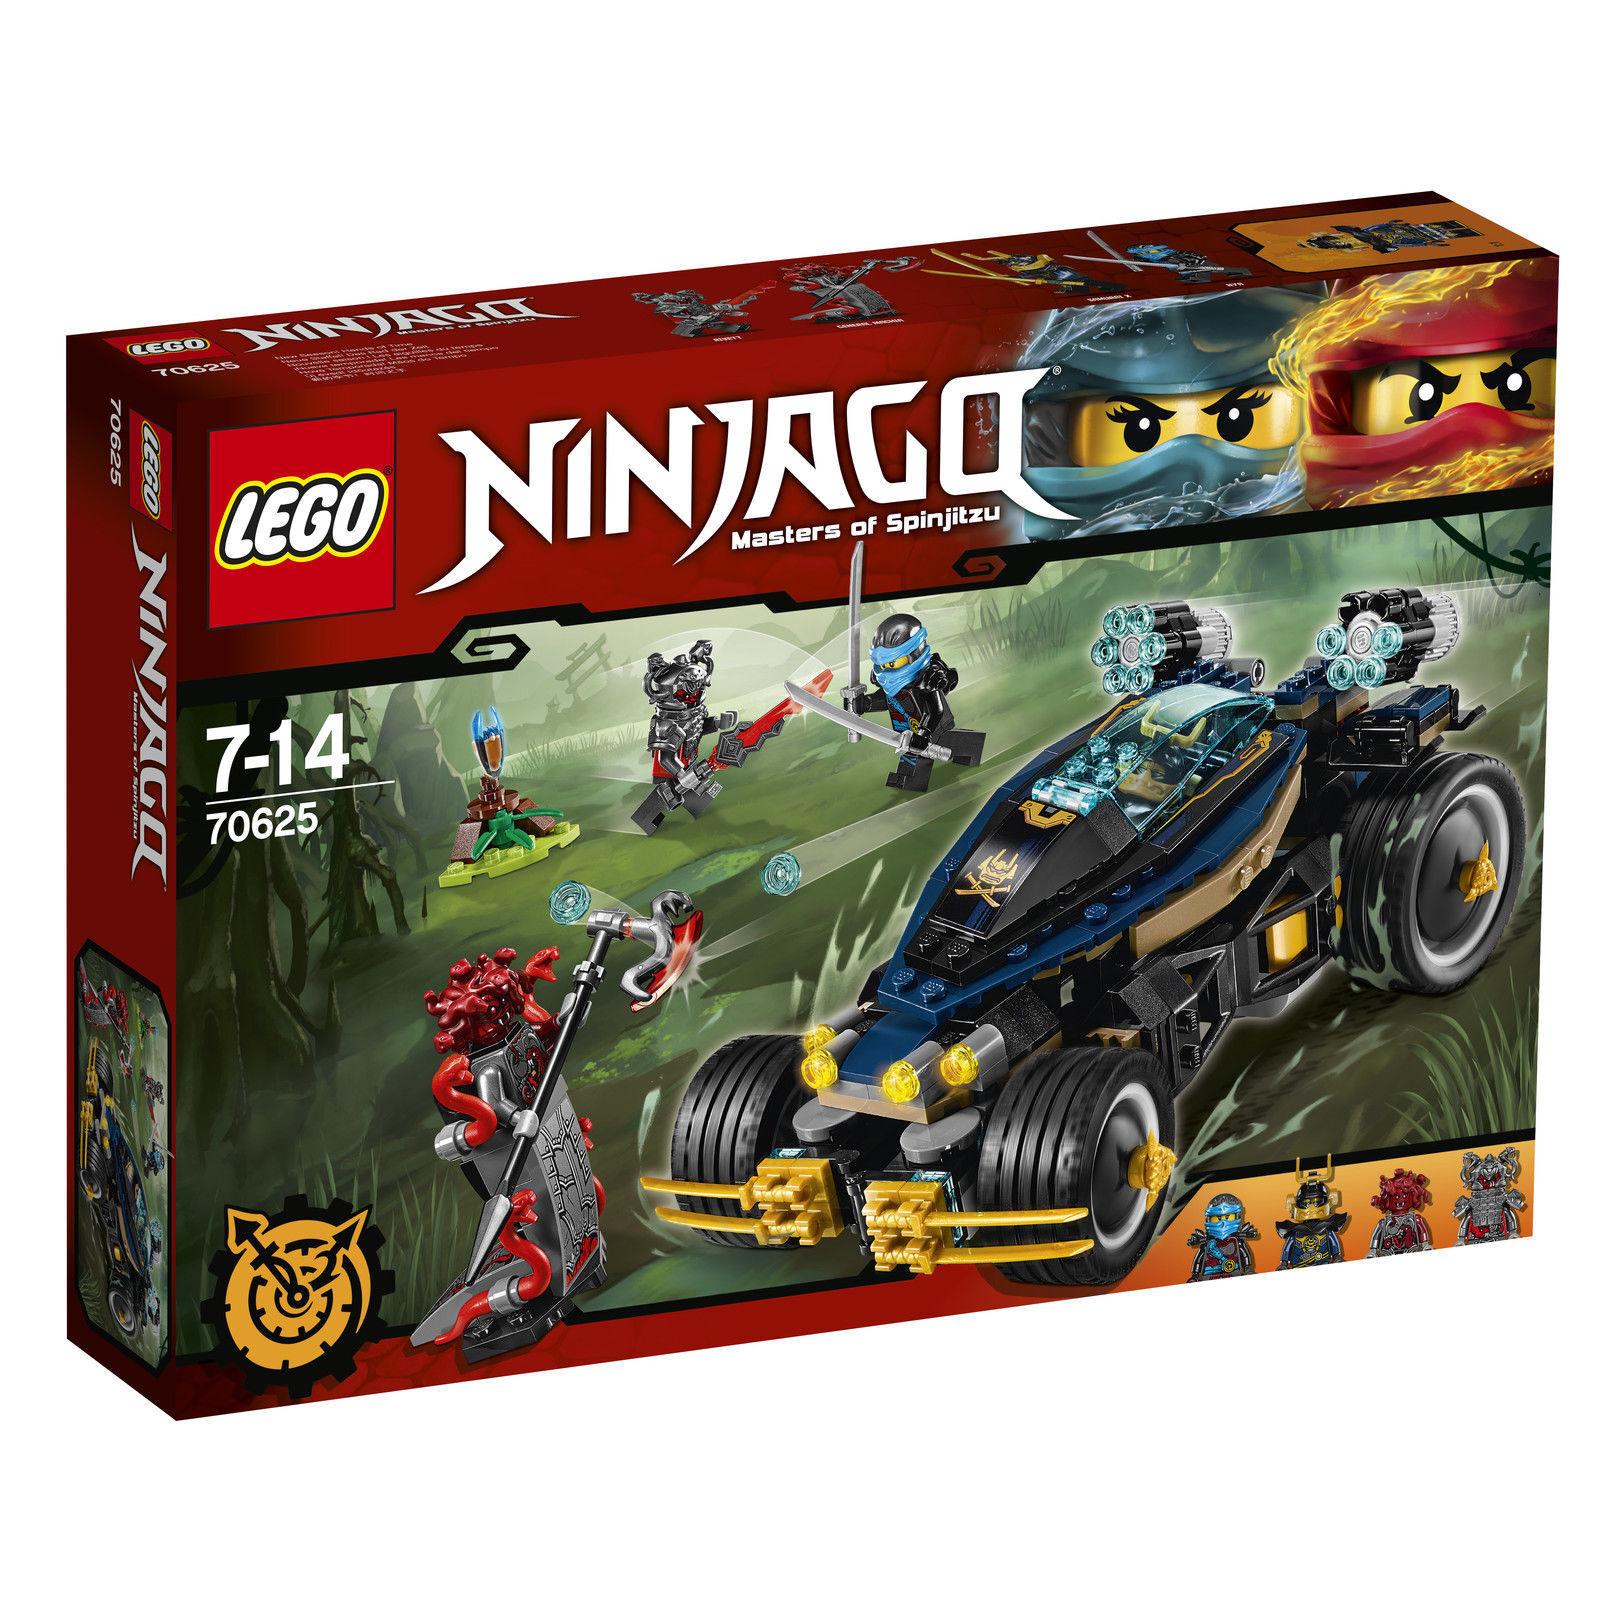 LEGO® NINJAGO™ (70625) Samurai Turbomobil inkl Versand Neu & Ovp